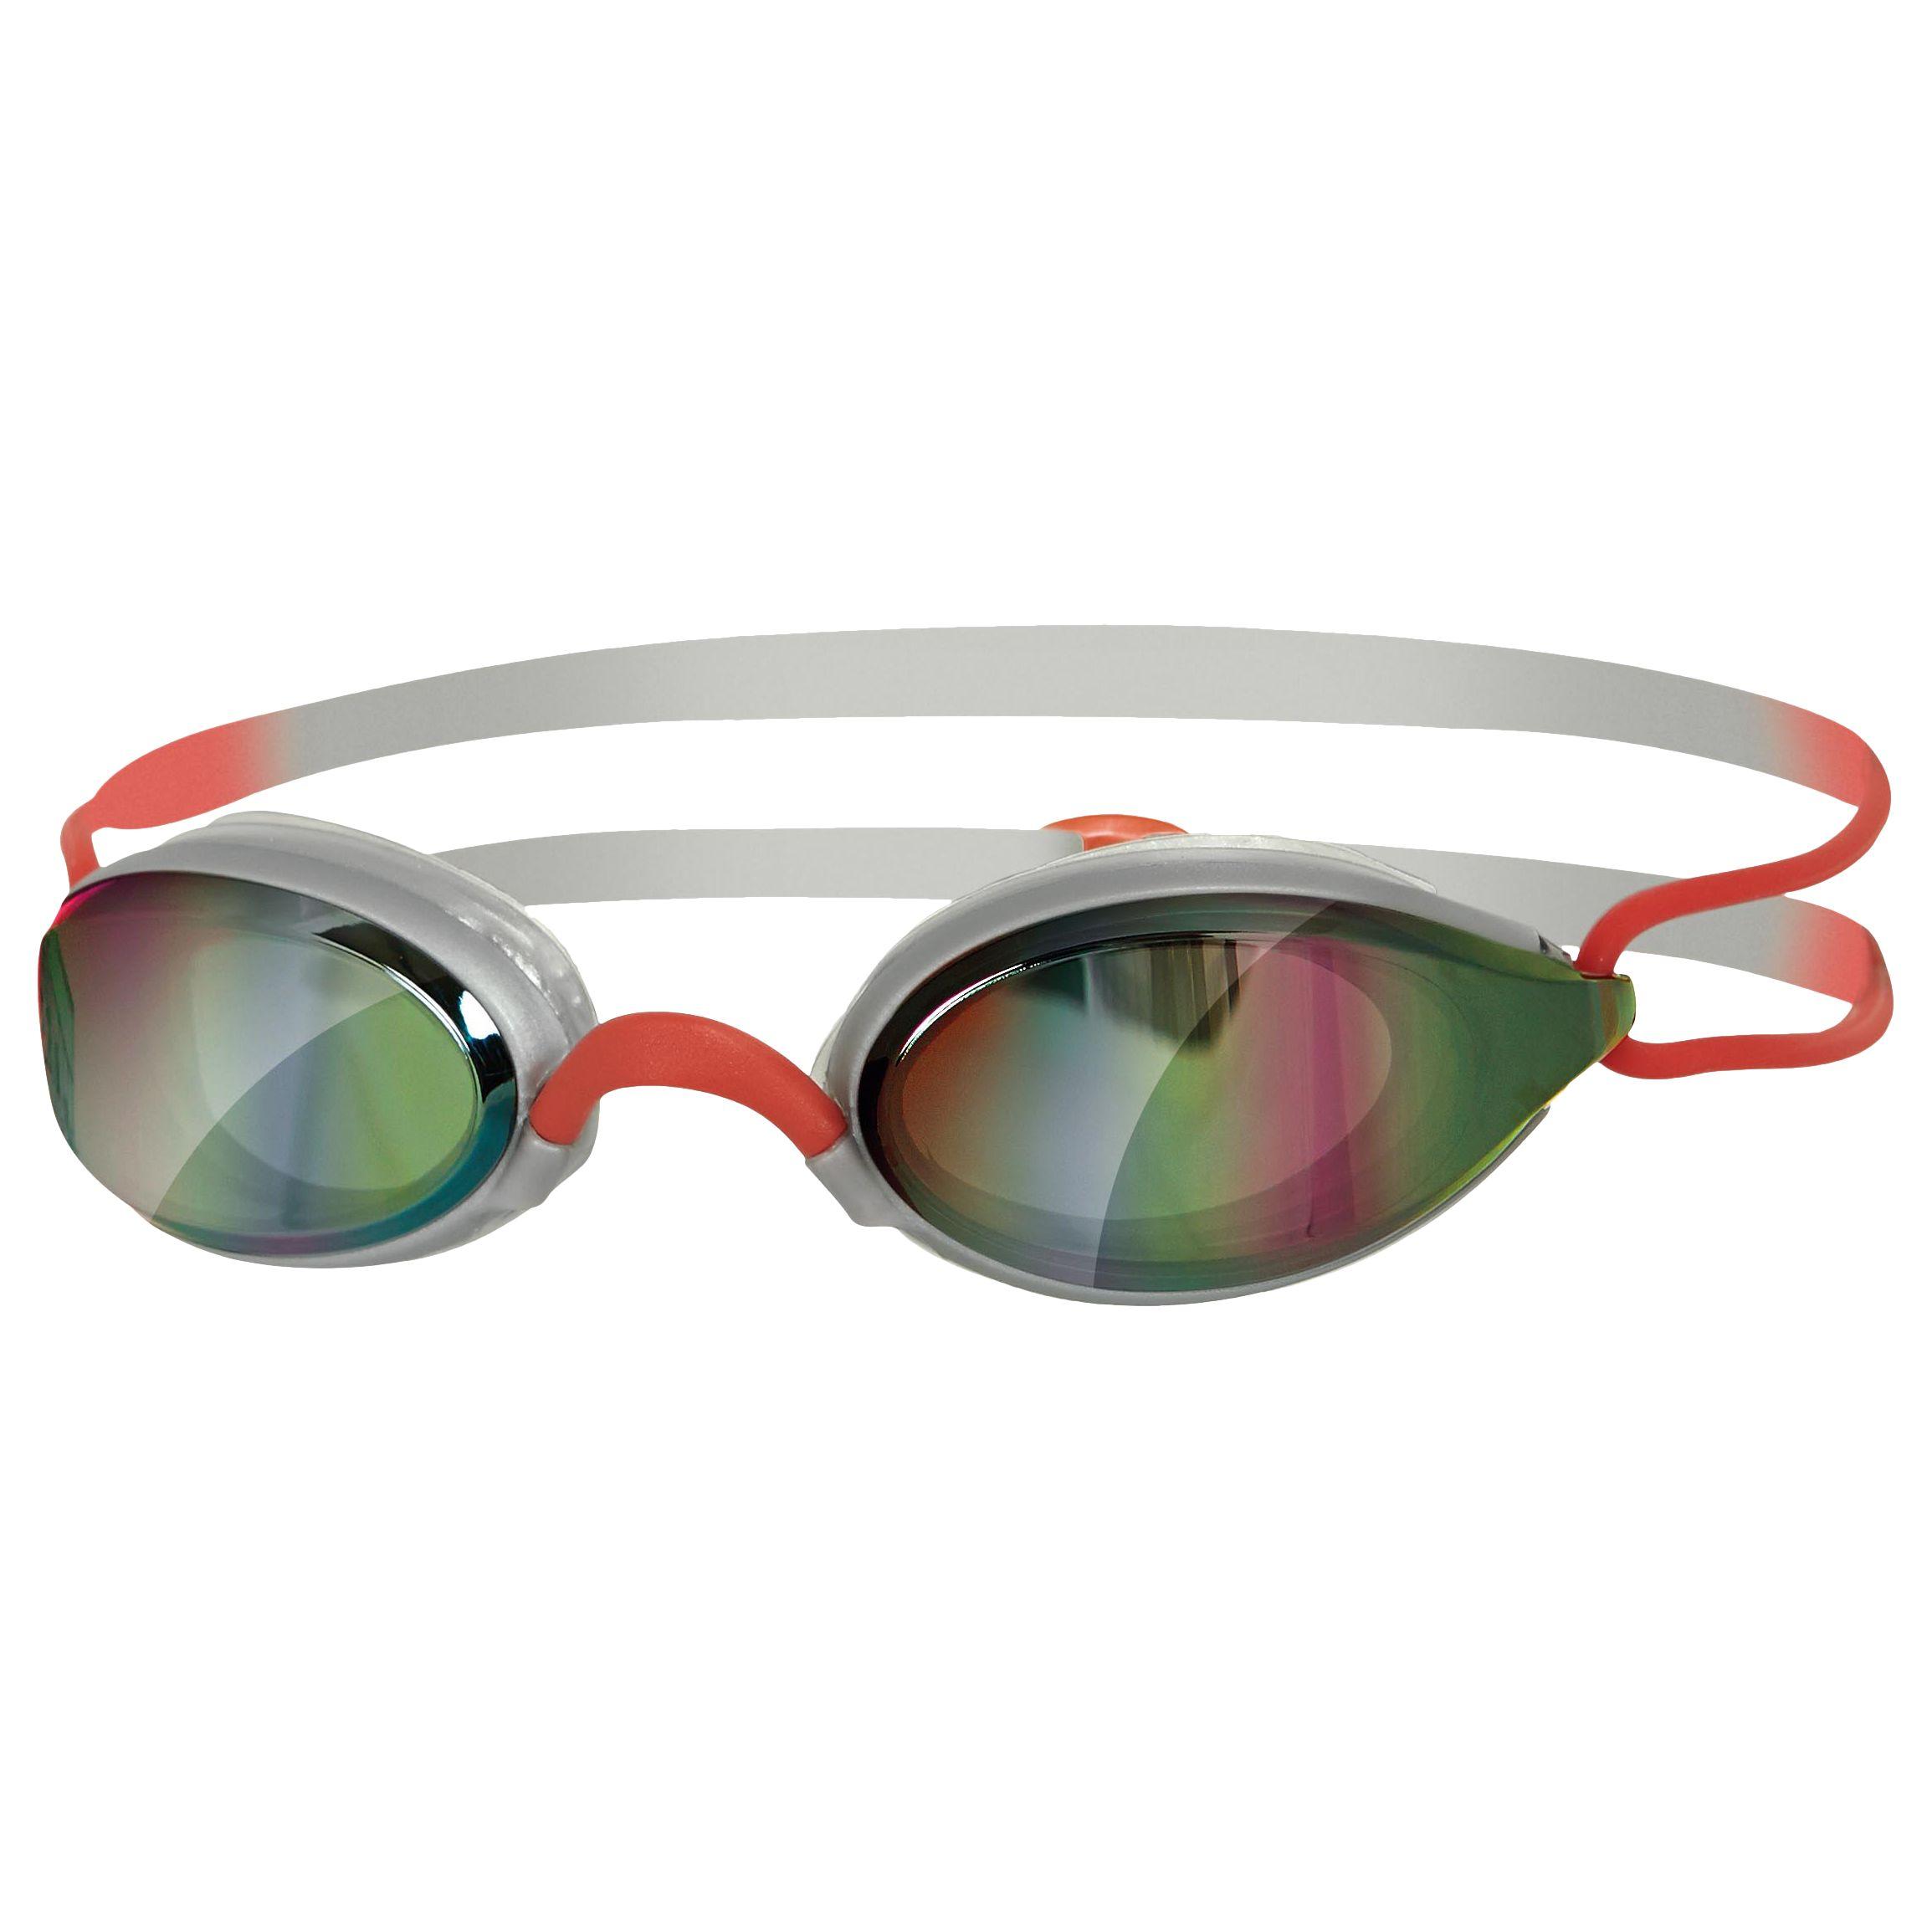 Zoggs Zoggs Fusion Air Gold Mirror Swimming Goggles, Silver/Red